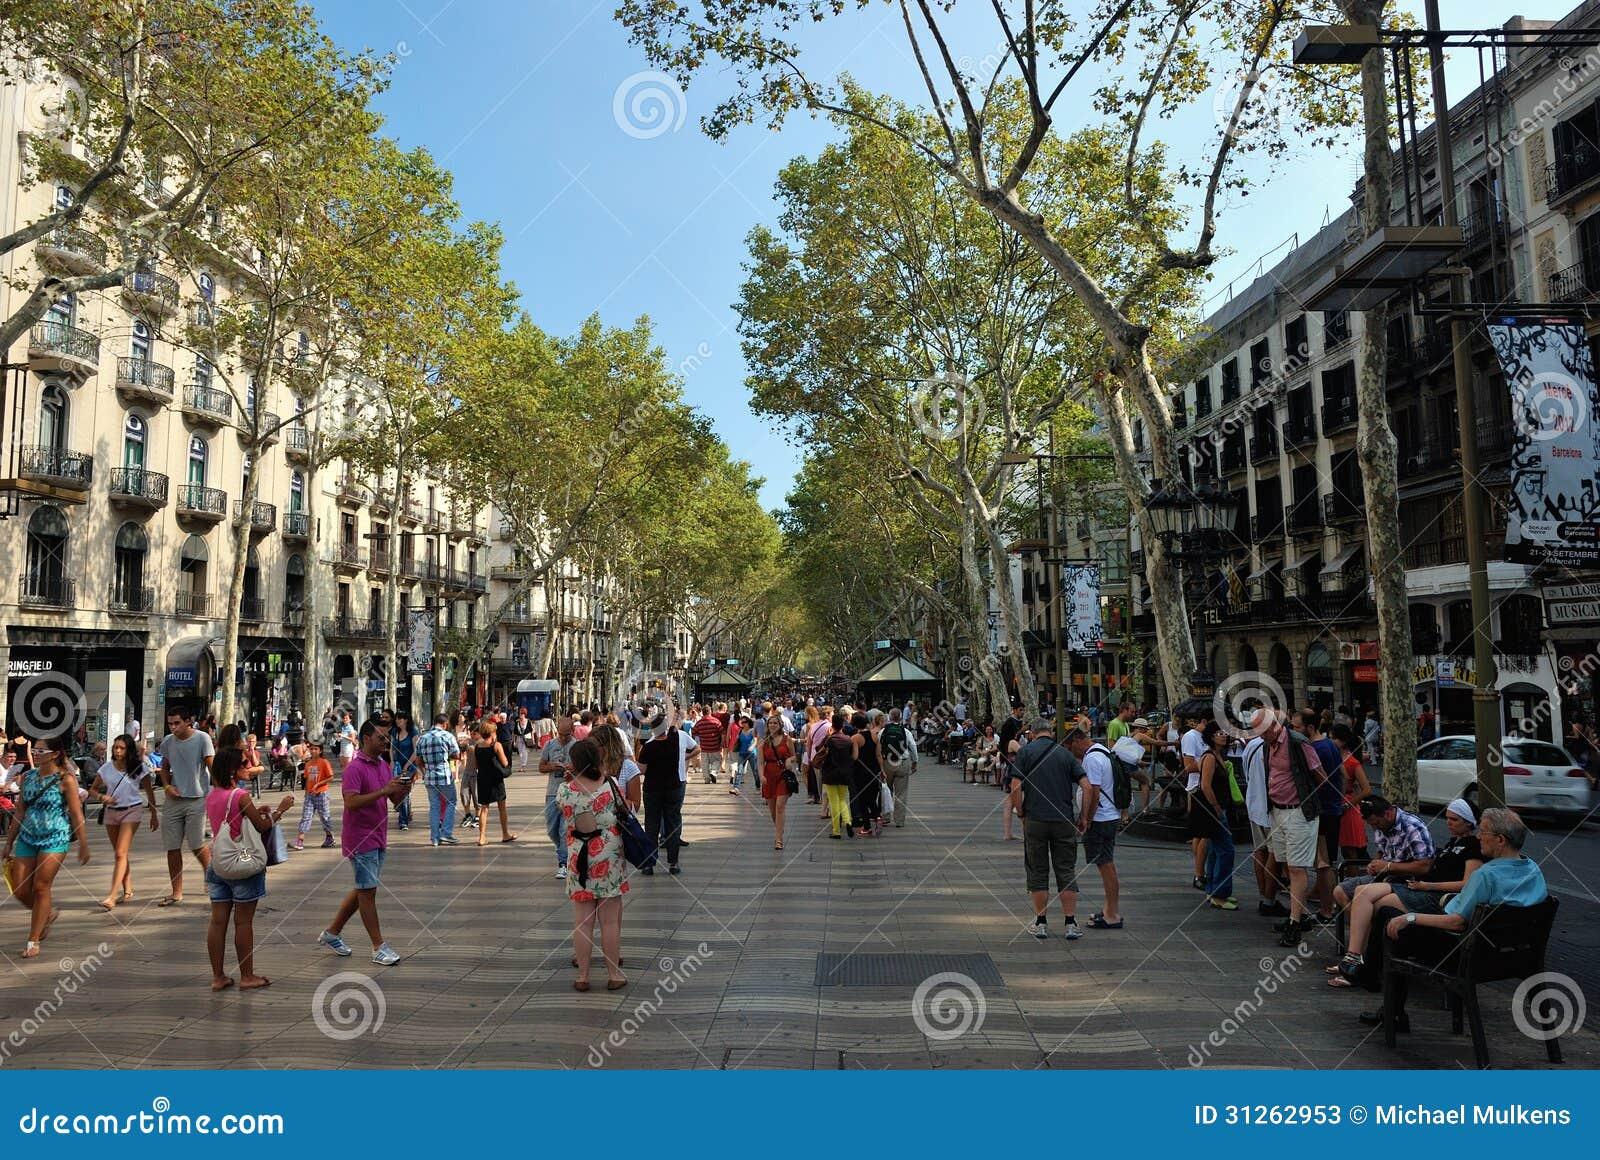 La Rambla, Barcelona Editorial Stock Photo - Image: 31262953